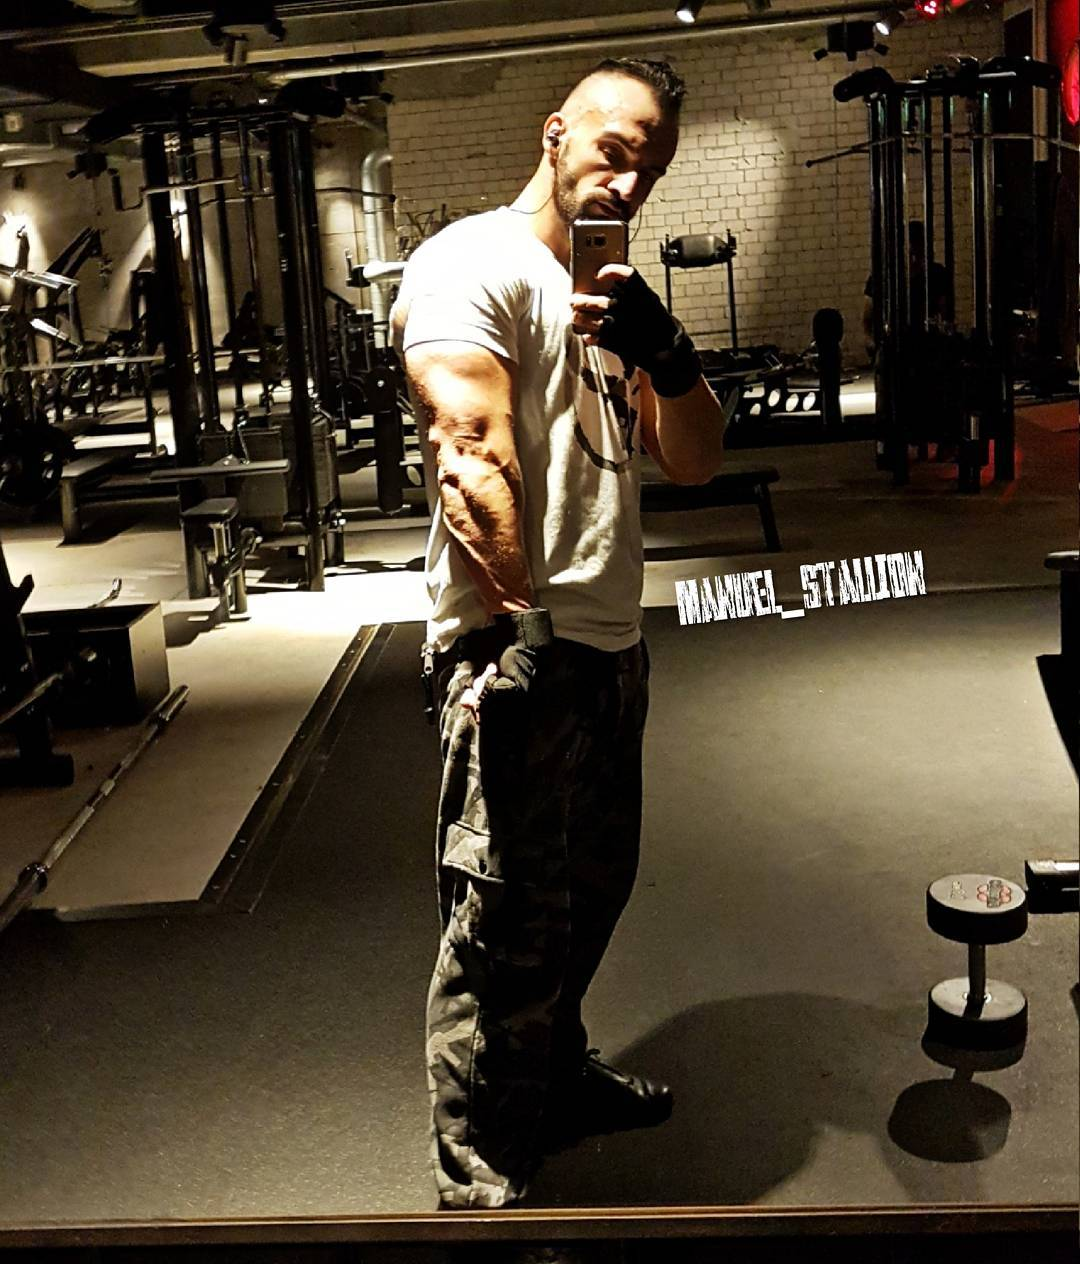 Freunde… ruft mich einfach an, wenn ihr einen Wagenheber braucht! 😎😉💪🏻 . #fitness #fit #fitfam #bodybuilding #selfie #me #mcfit #mcfitberlin #johnreed #motivation #sport #lifestyle #body #muscles #muskeln #pump #pumped #german #berlin #berliner #gym #nopainnogain #pusher #instagood #instafit #l4l #killer #bangboss #bosslife